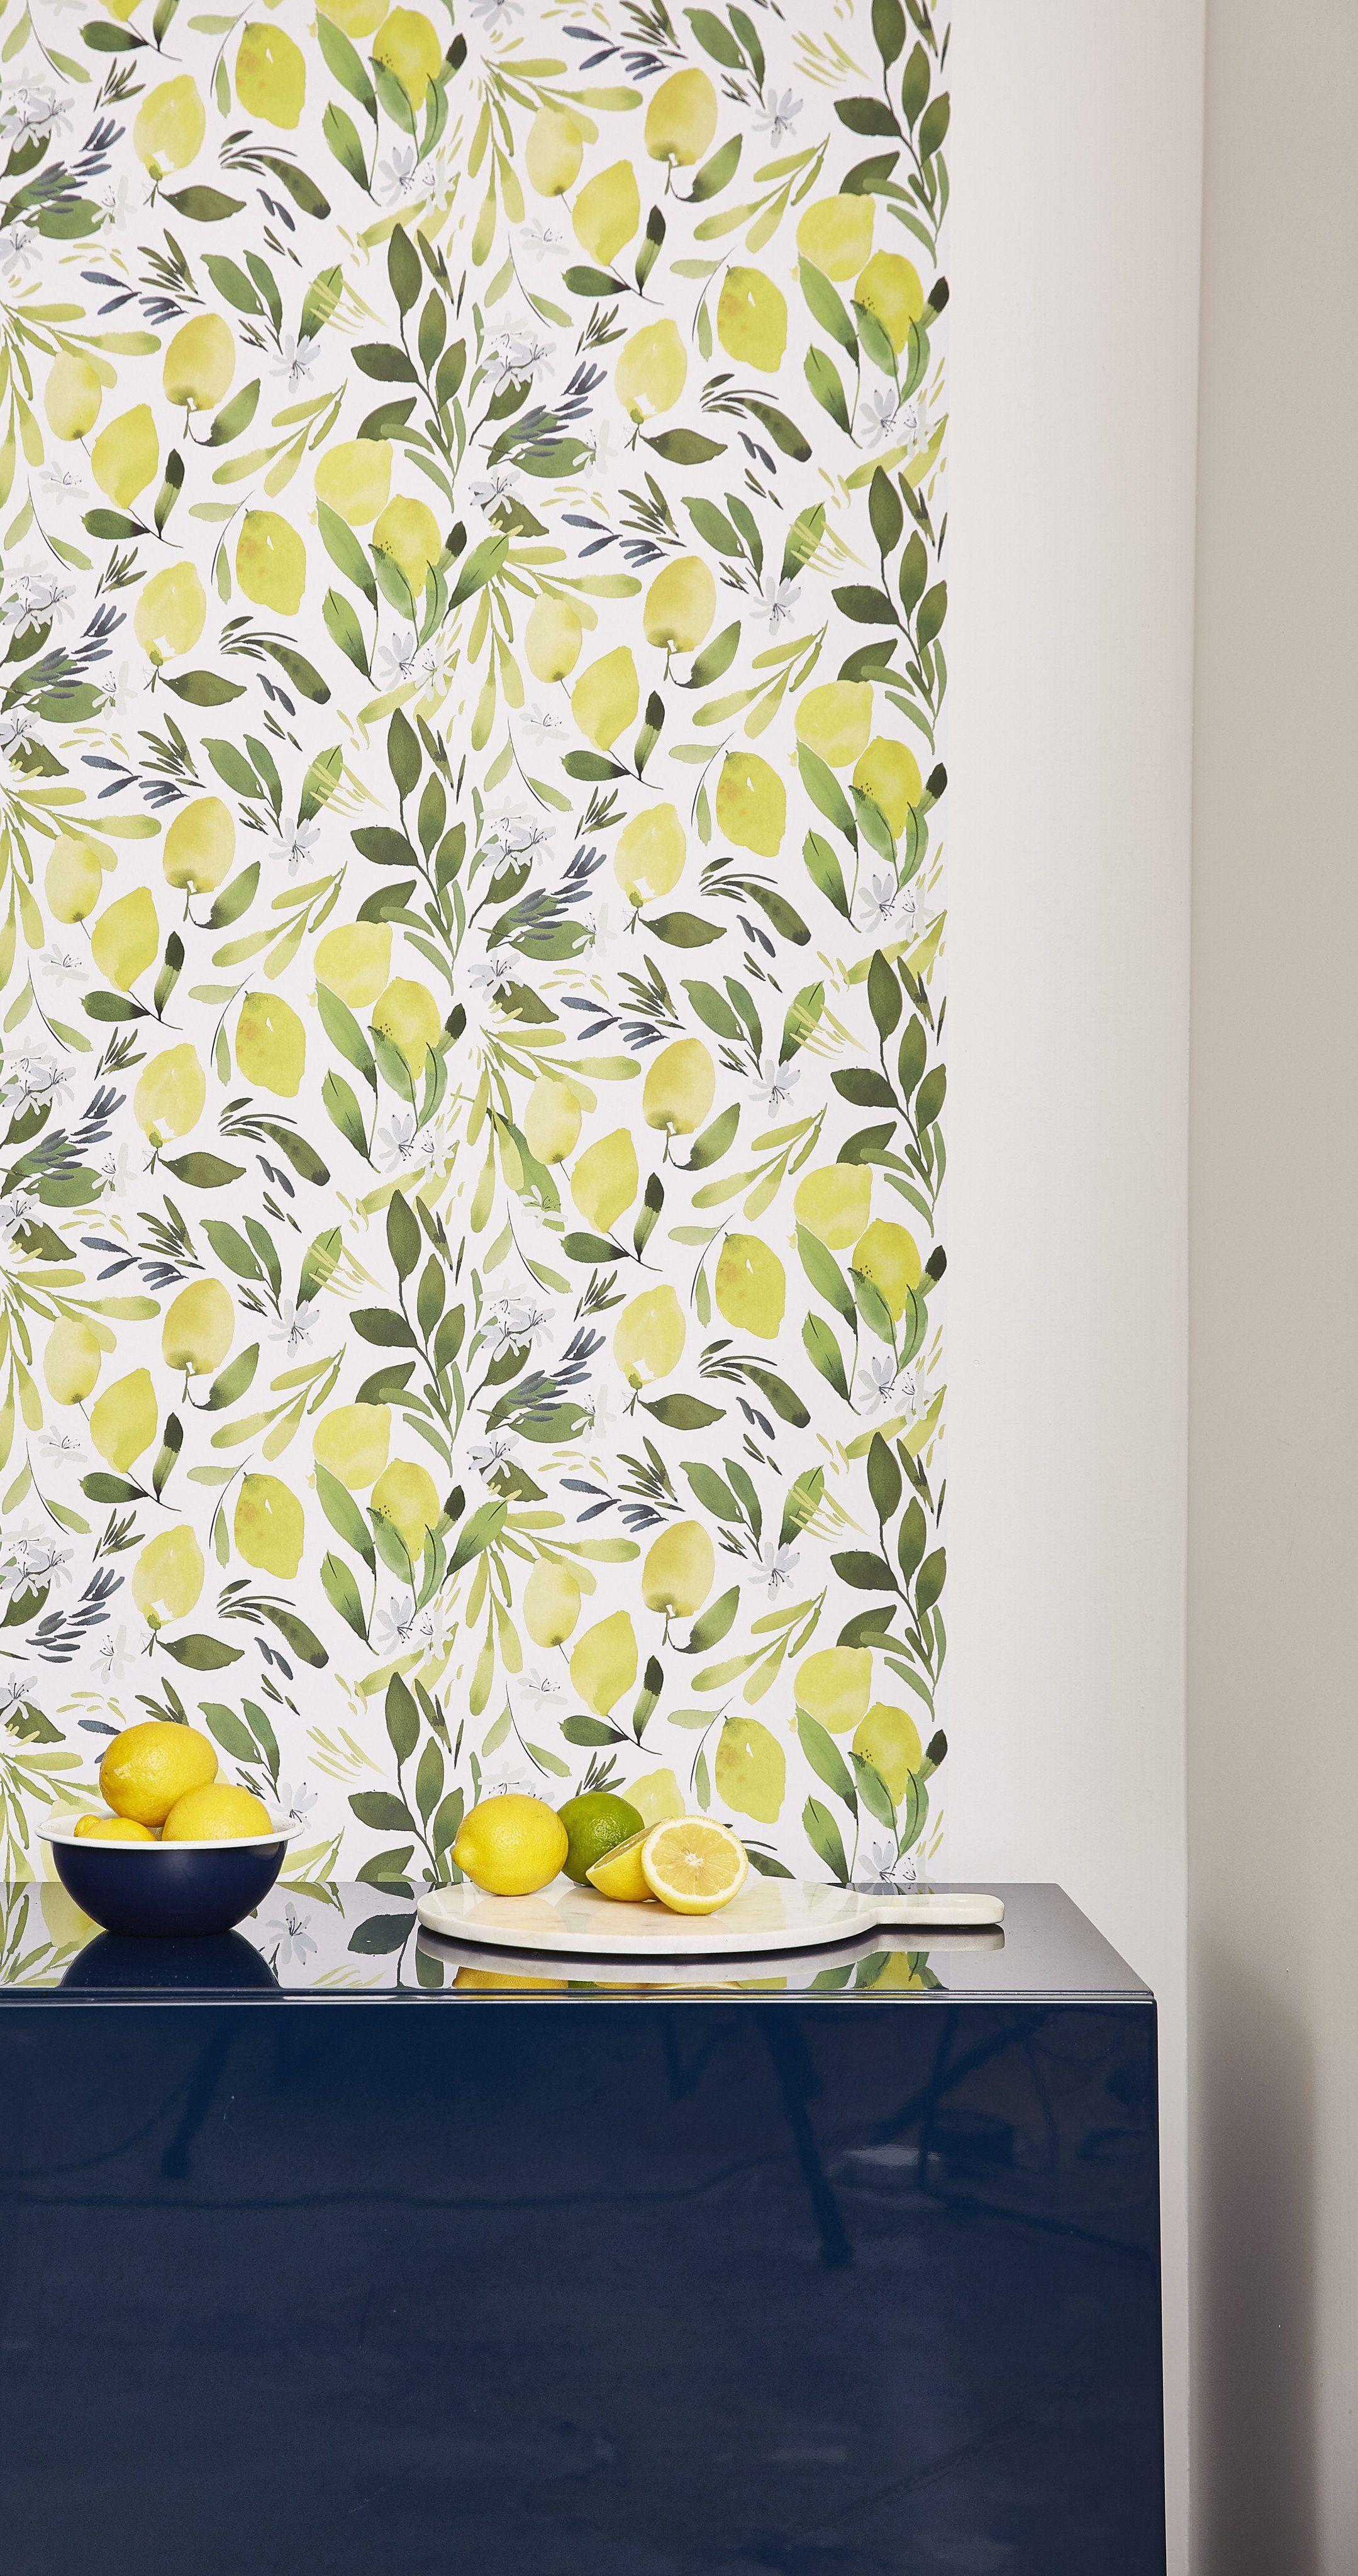 Lemon Fresh Chasing Paper Shop Wall Decor Chasing Paper Wallpaper